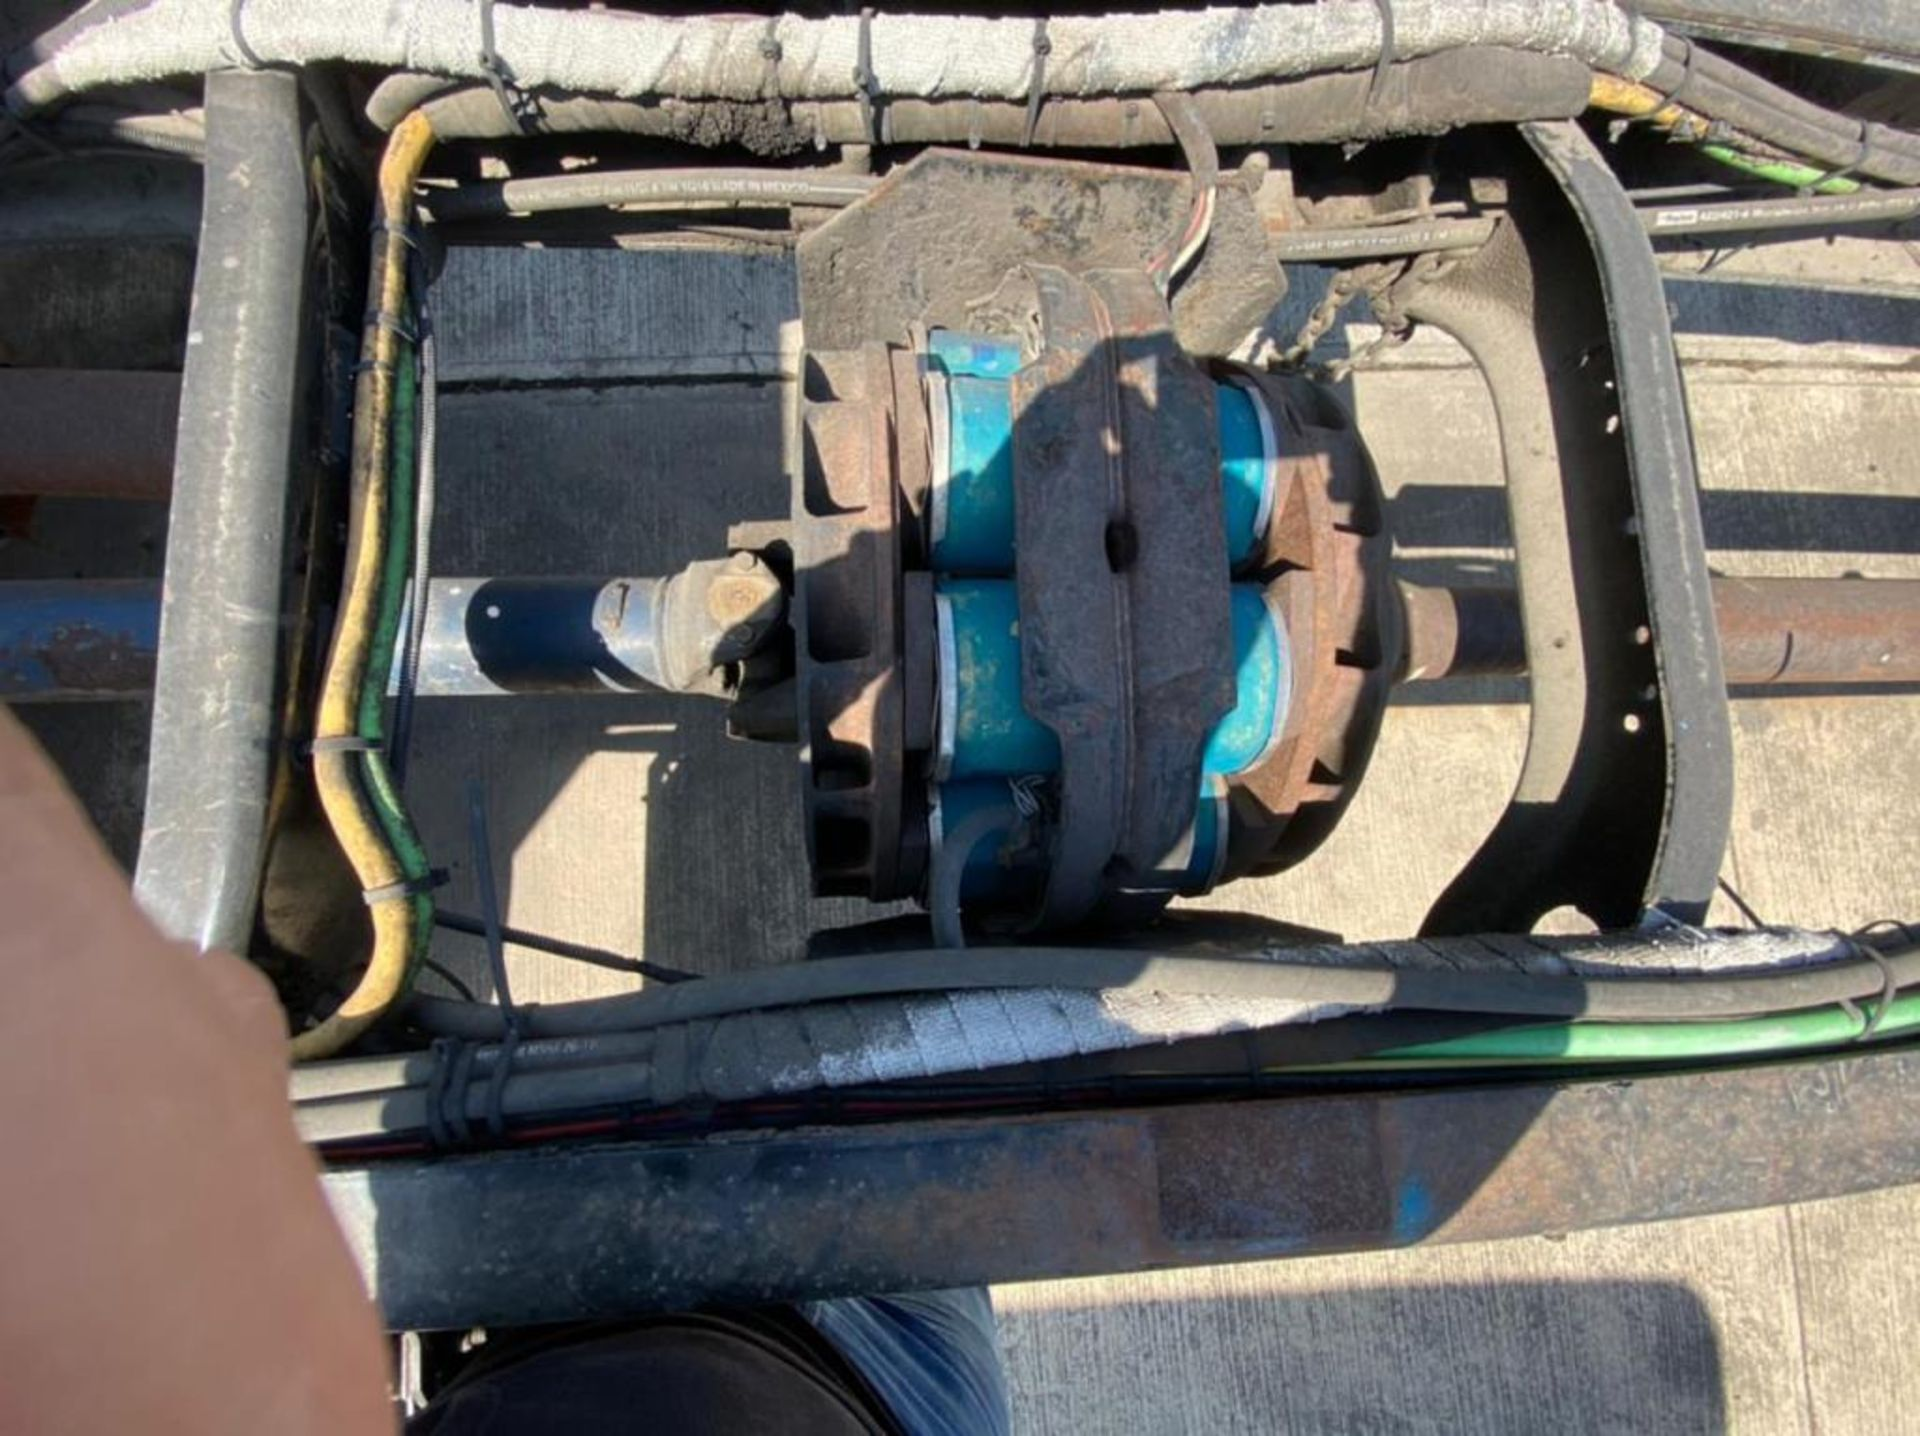 Tractocamión Marca STERLING, LT9500, Modelo 2001 - Image 9 of 27